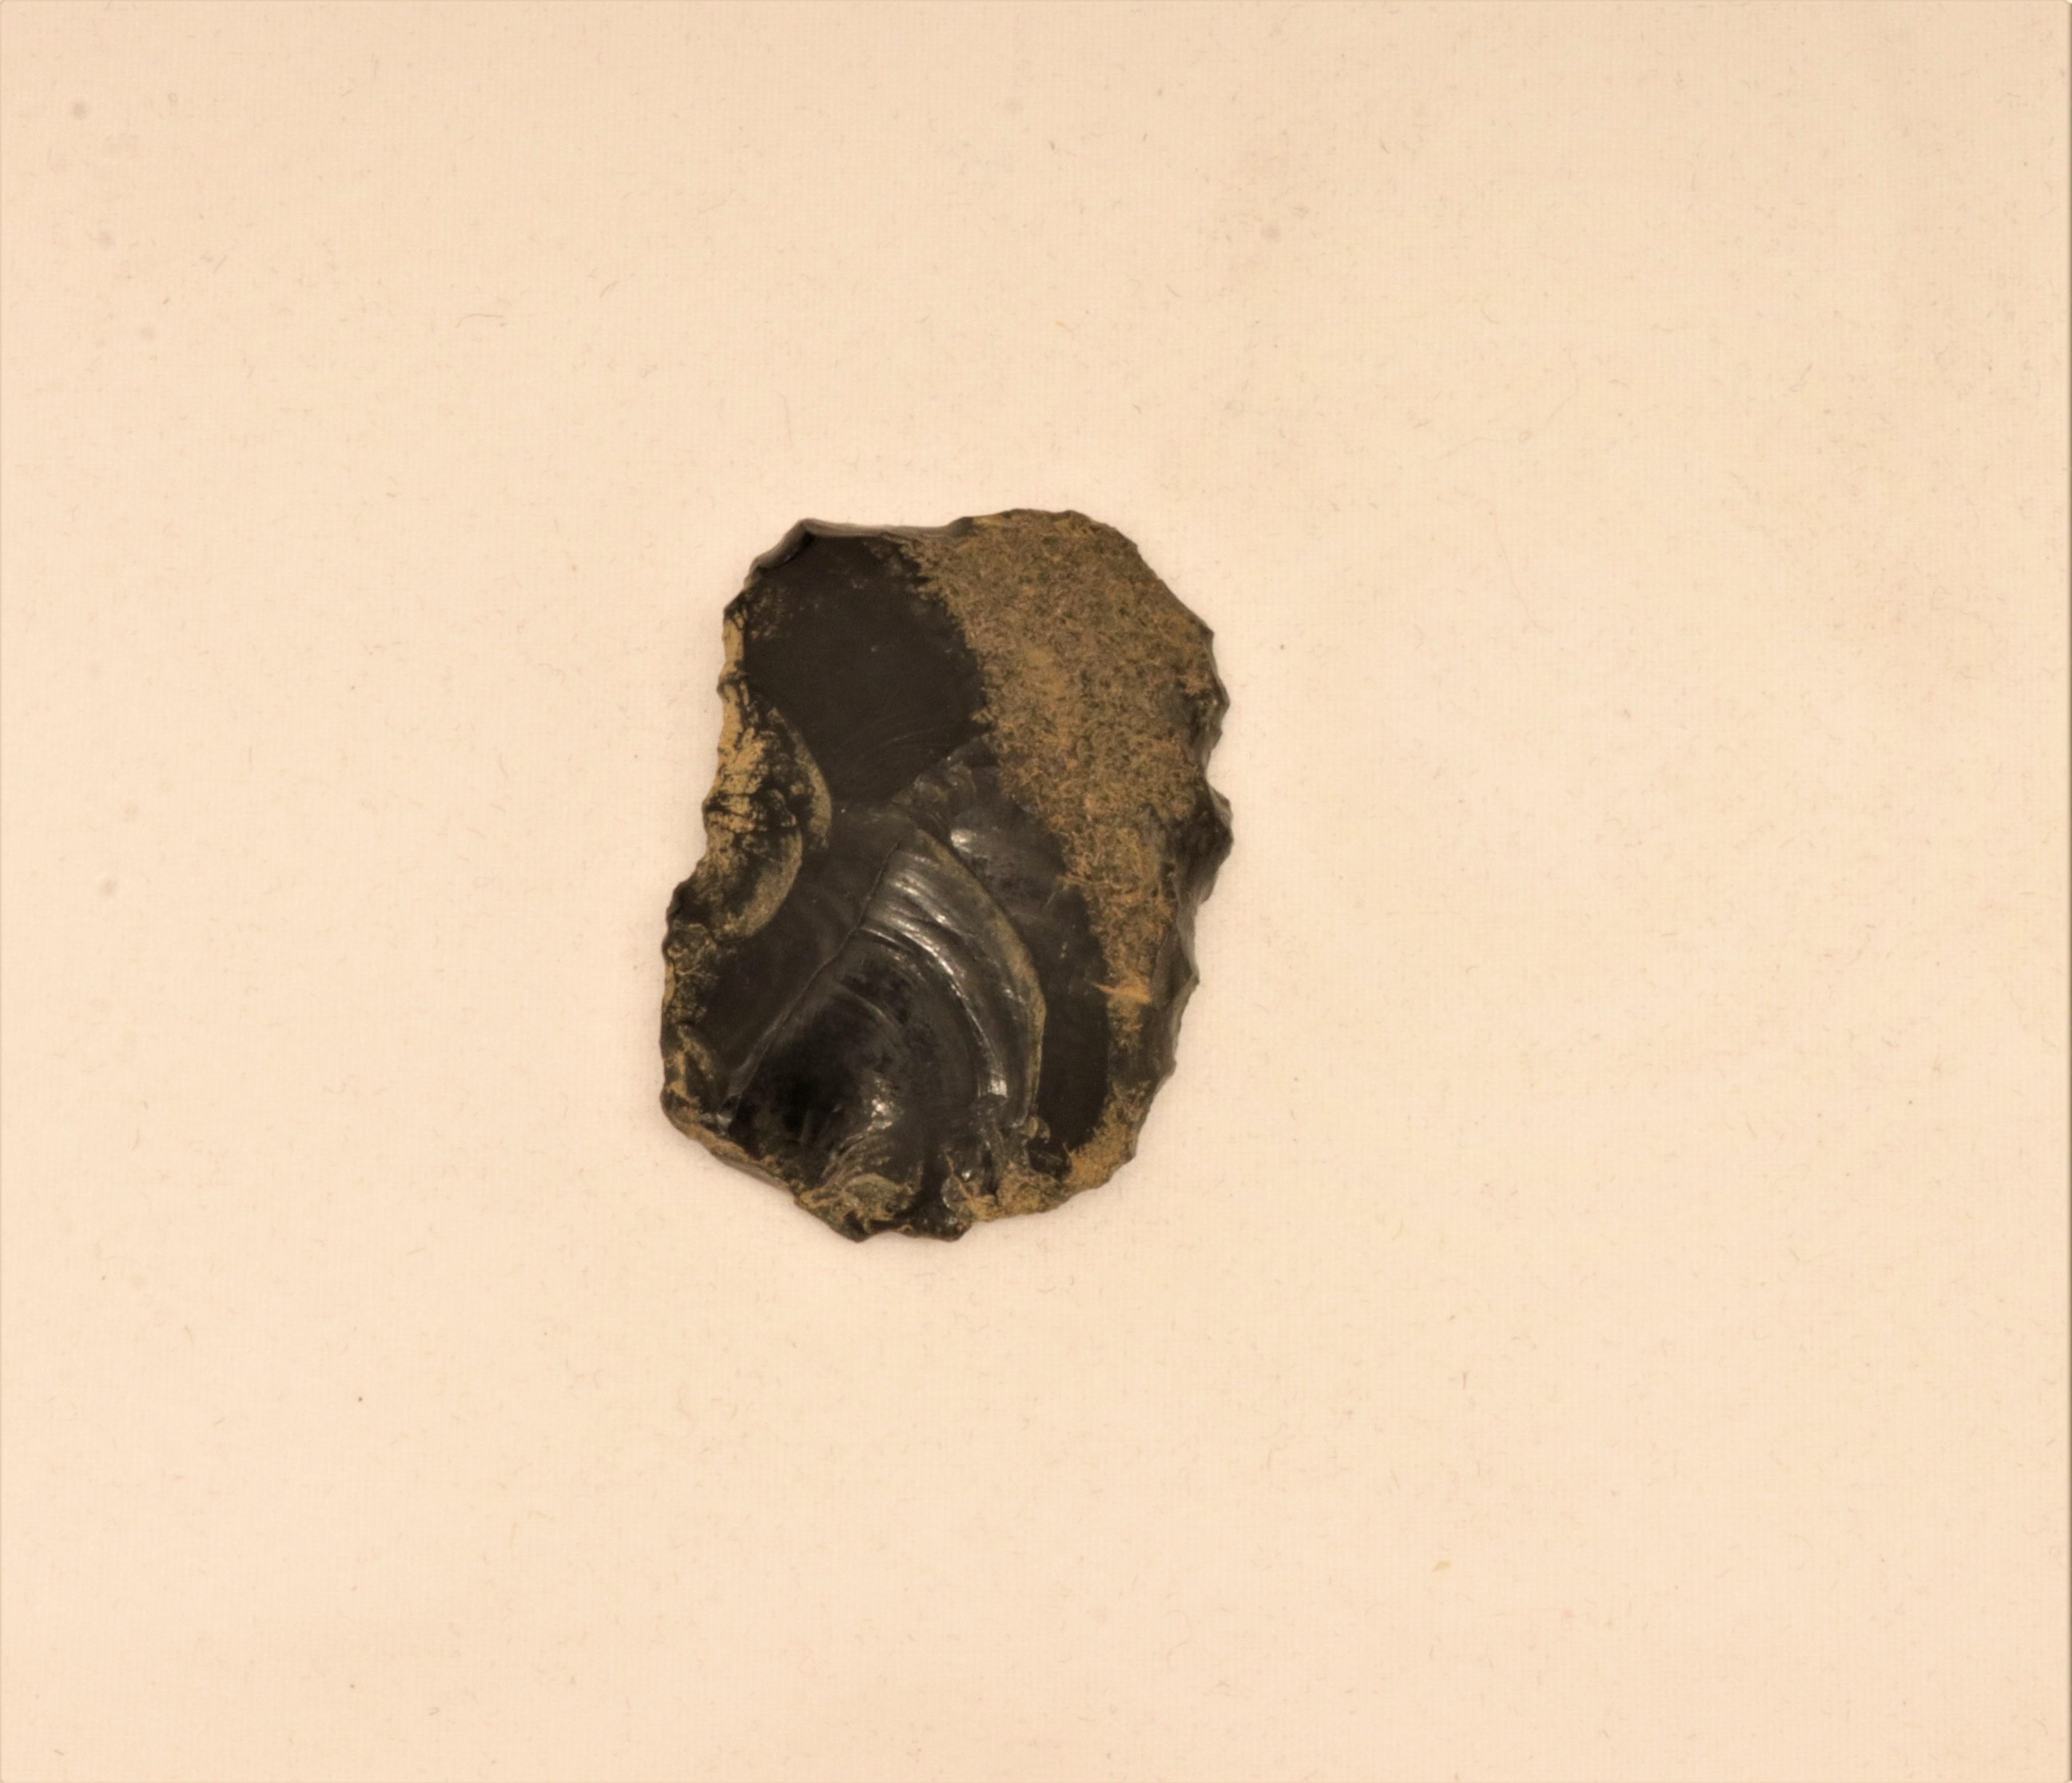 Raspador de obsidiana